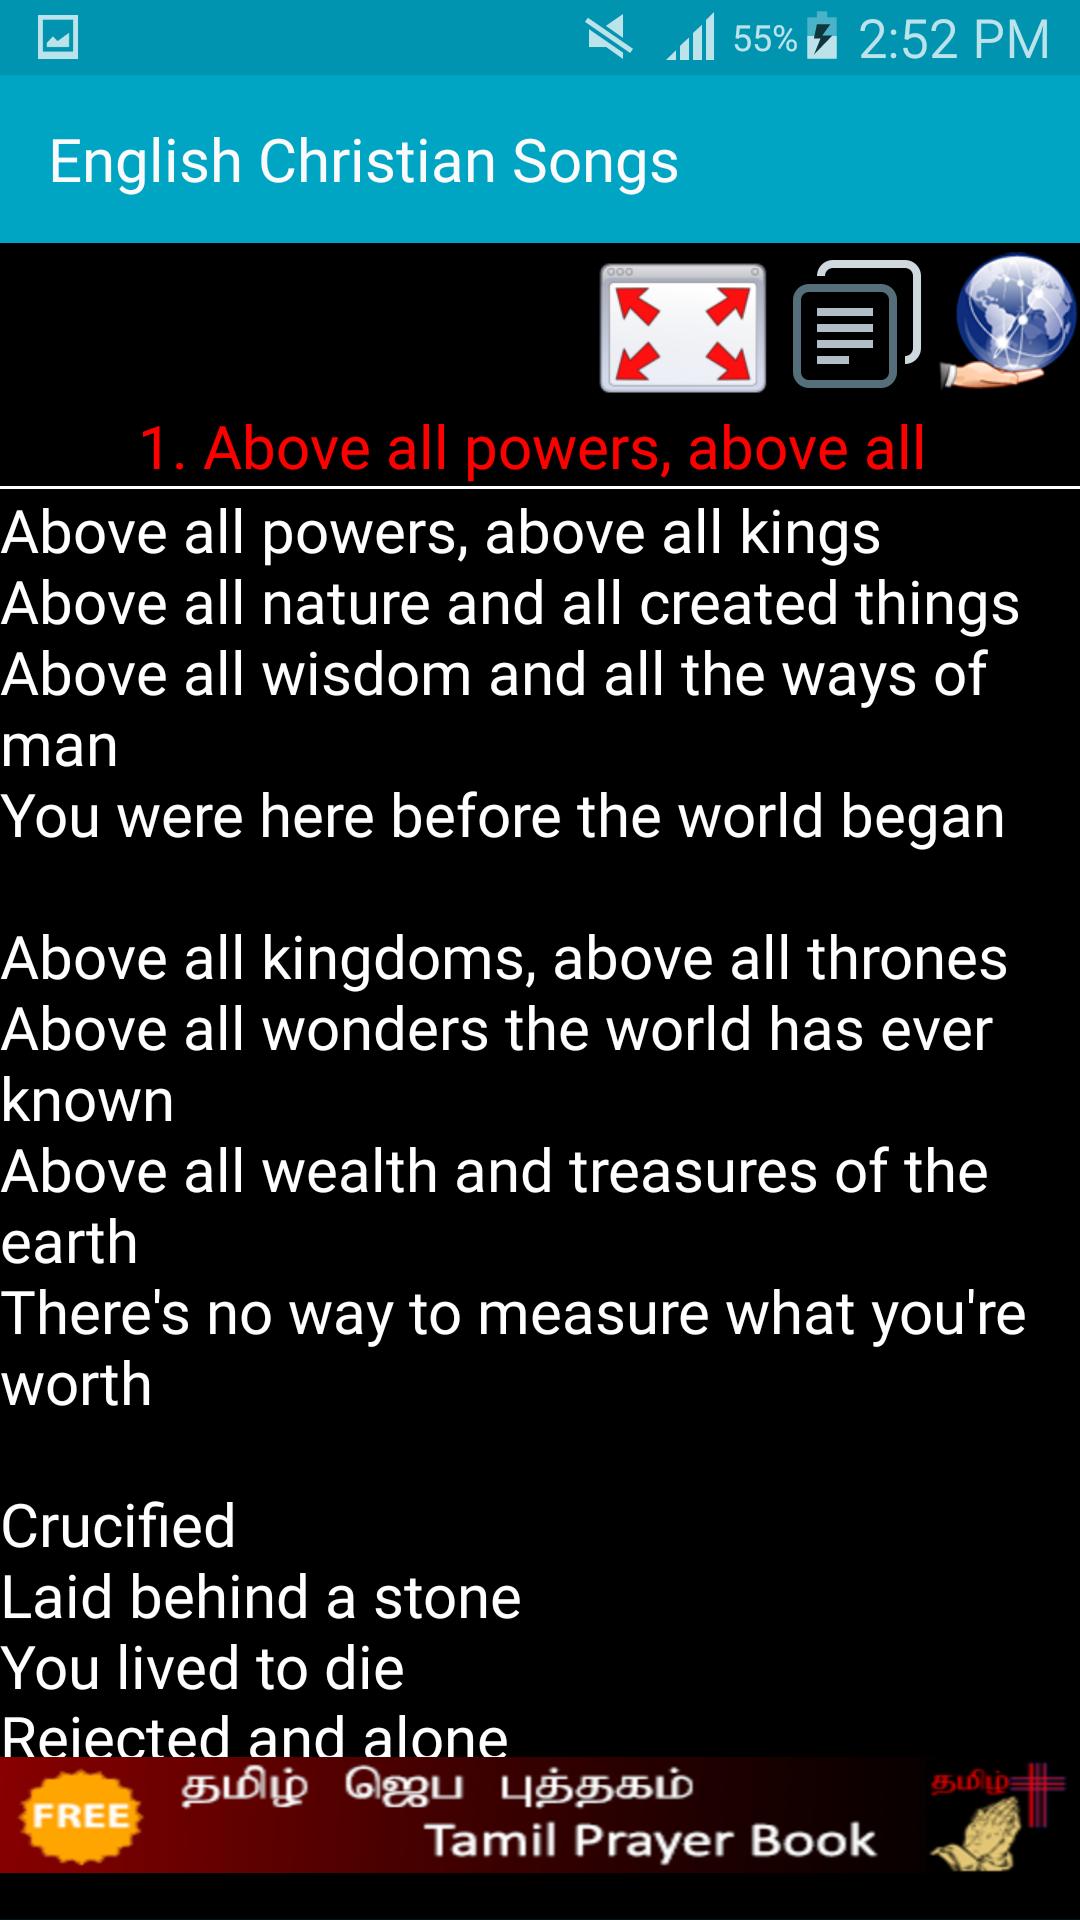 New english christian songs